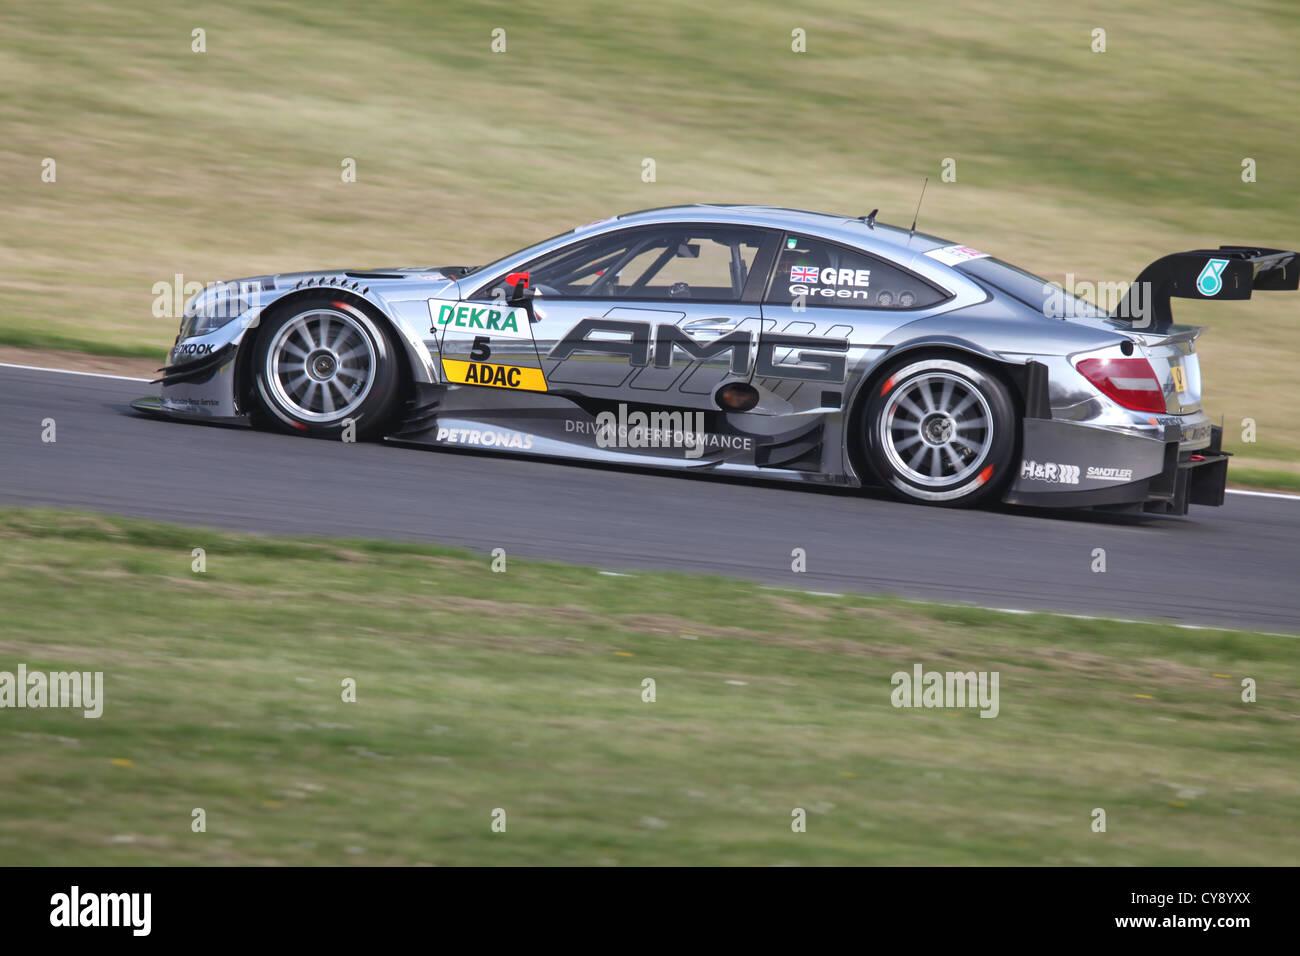 Mercedes DTM racing car at Brands Hatch 2012, England. - Stock Image